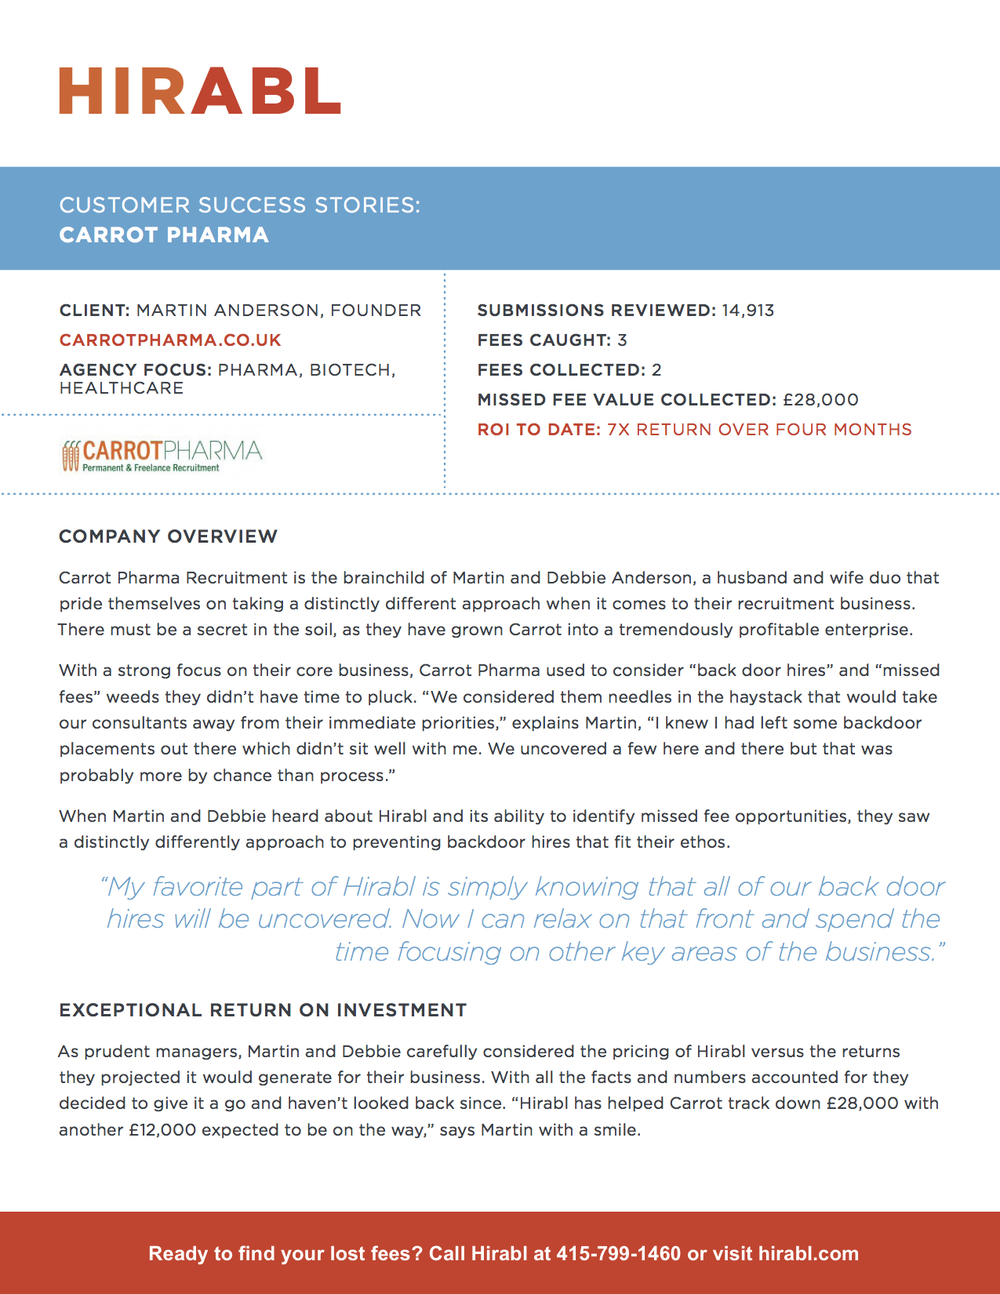 Hirabl Case Study Carrot Pharma1.jpg